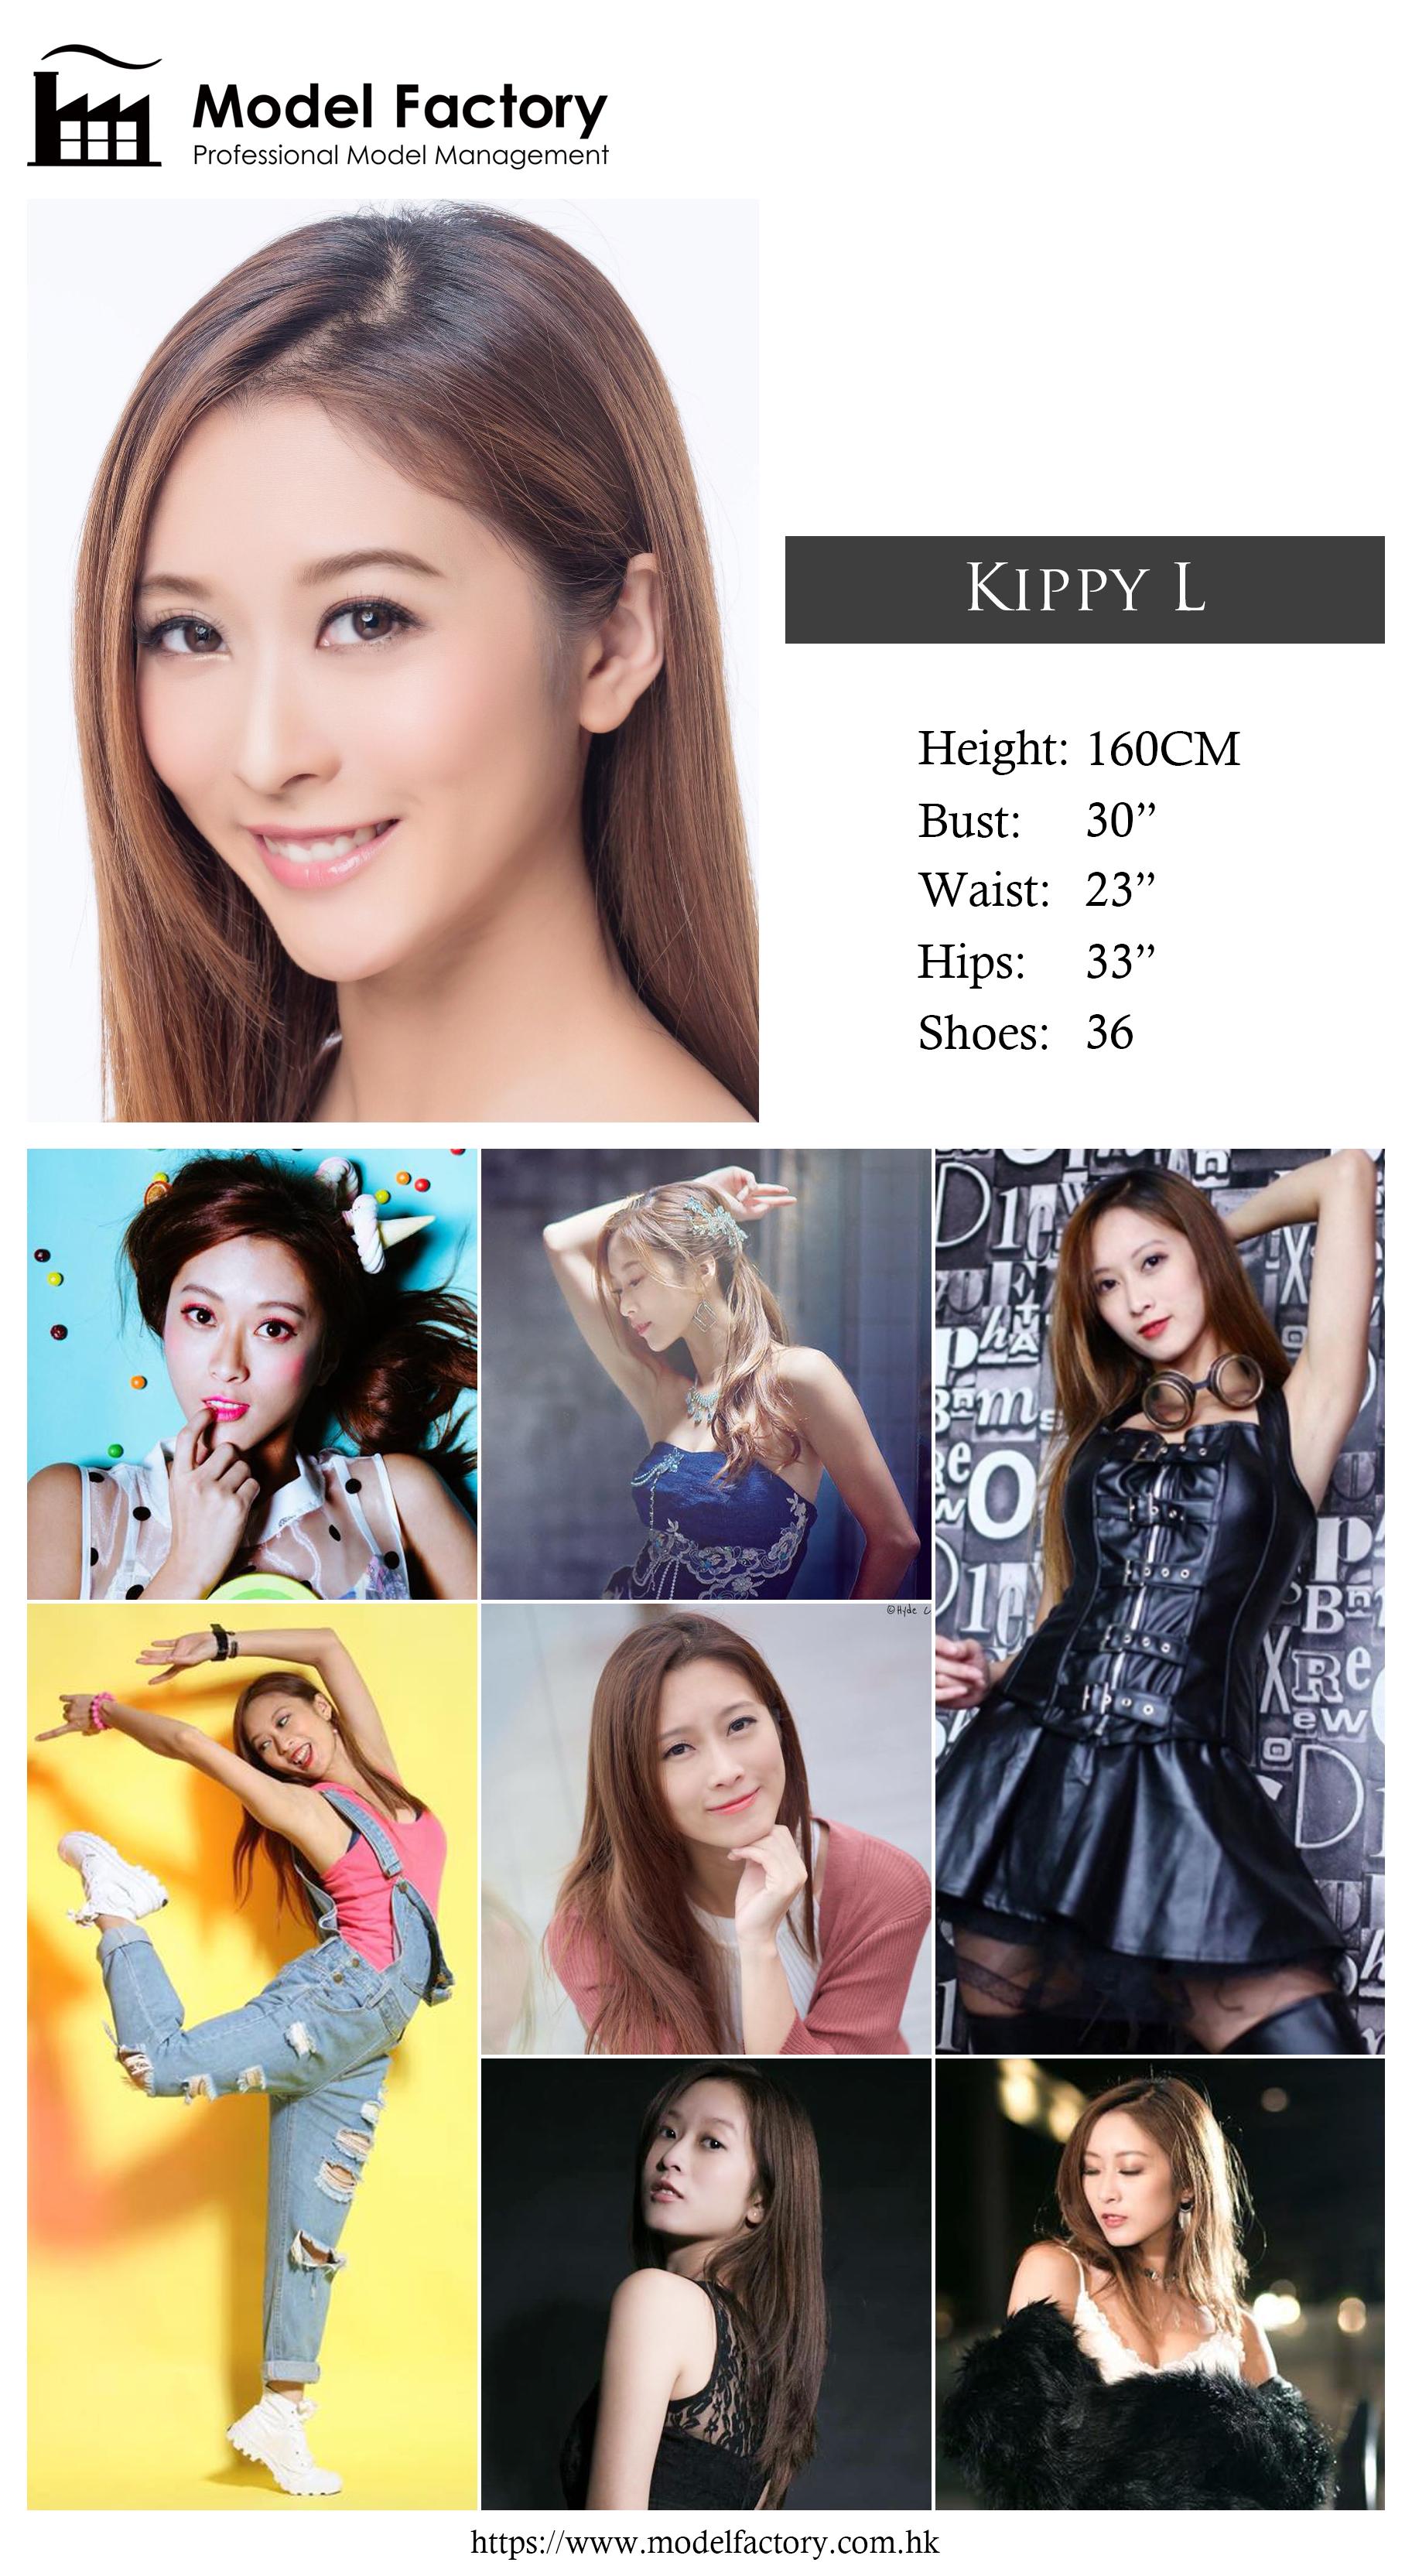 Model Factory Hong Kong Female Model KippyL